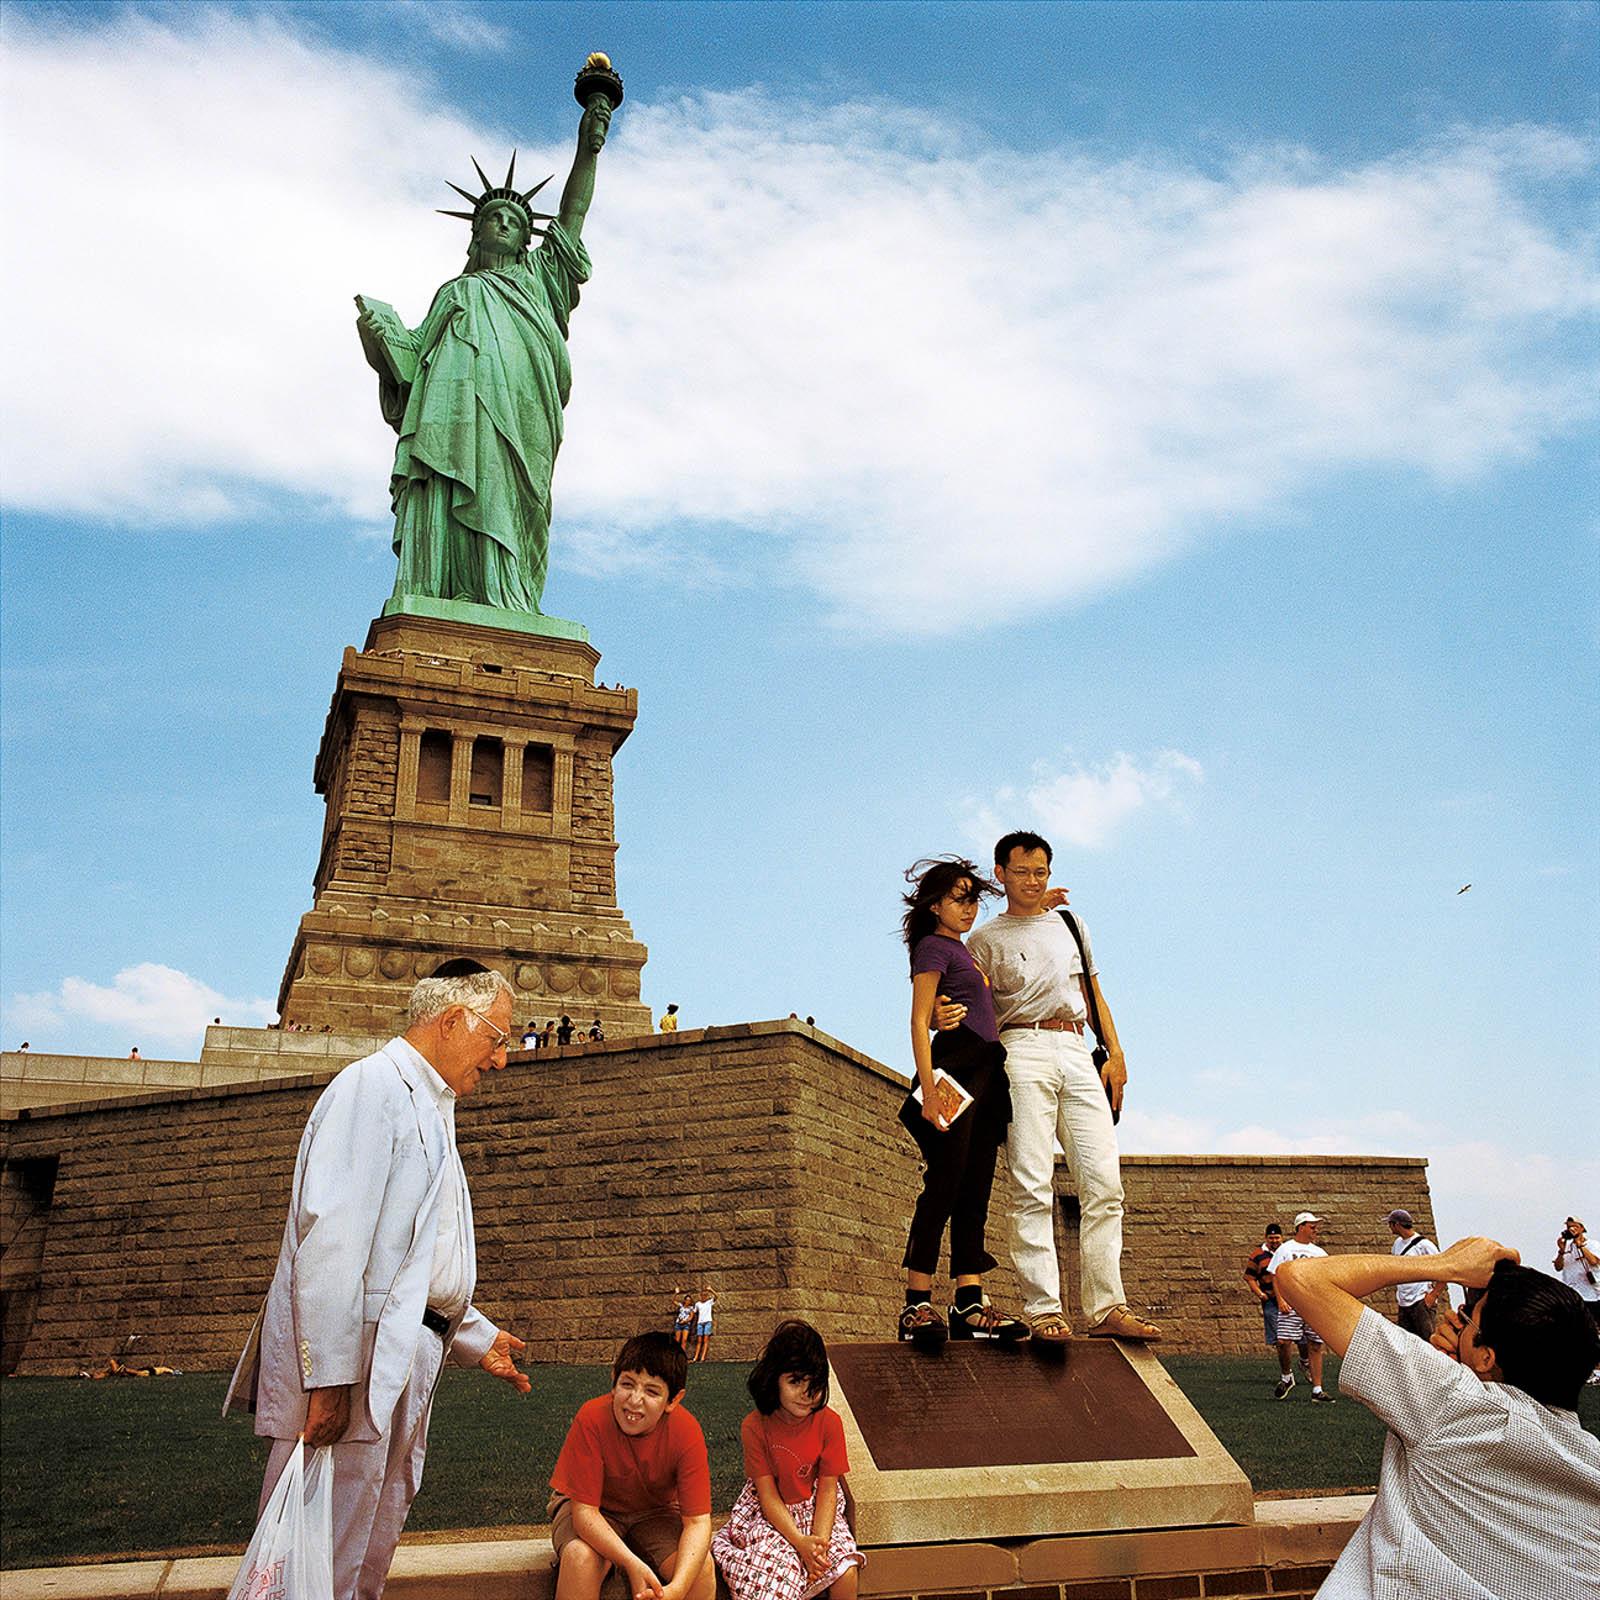 Visitors at Statue of Liberty Island, New York 2000